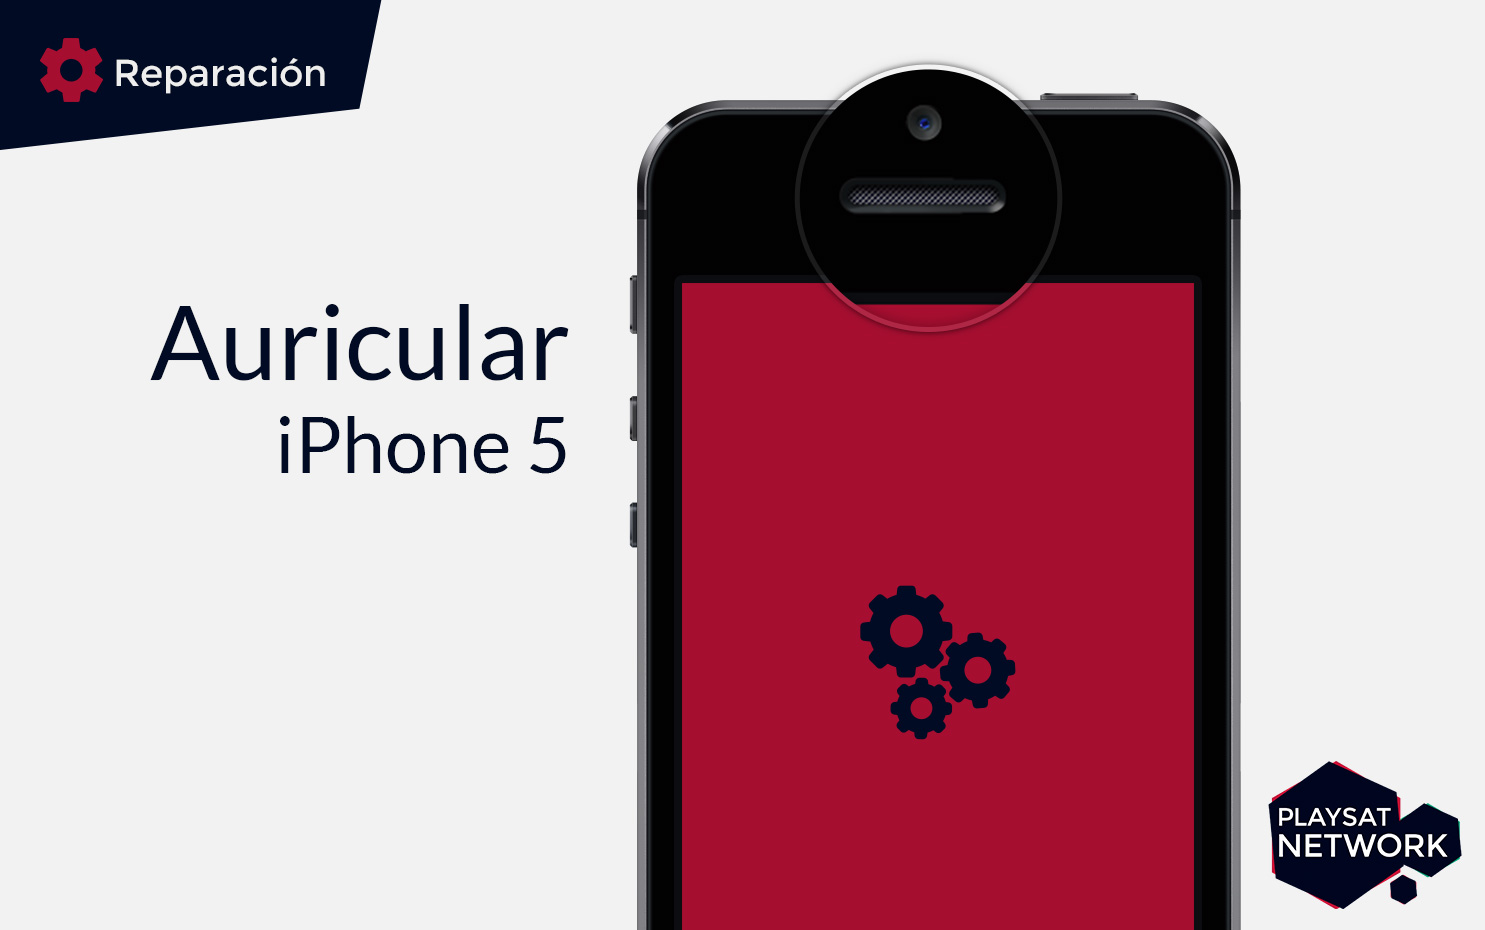 Reparar auricular iPhone 5